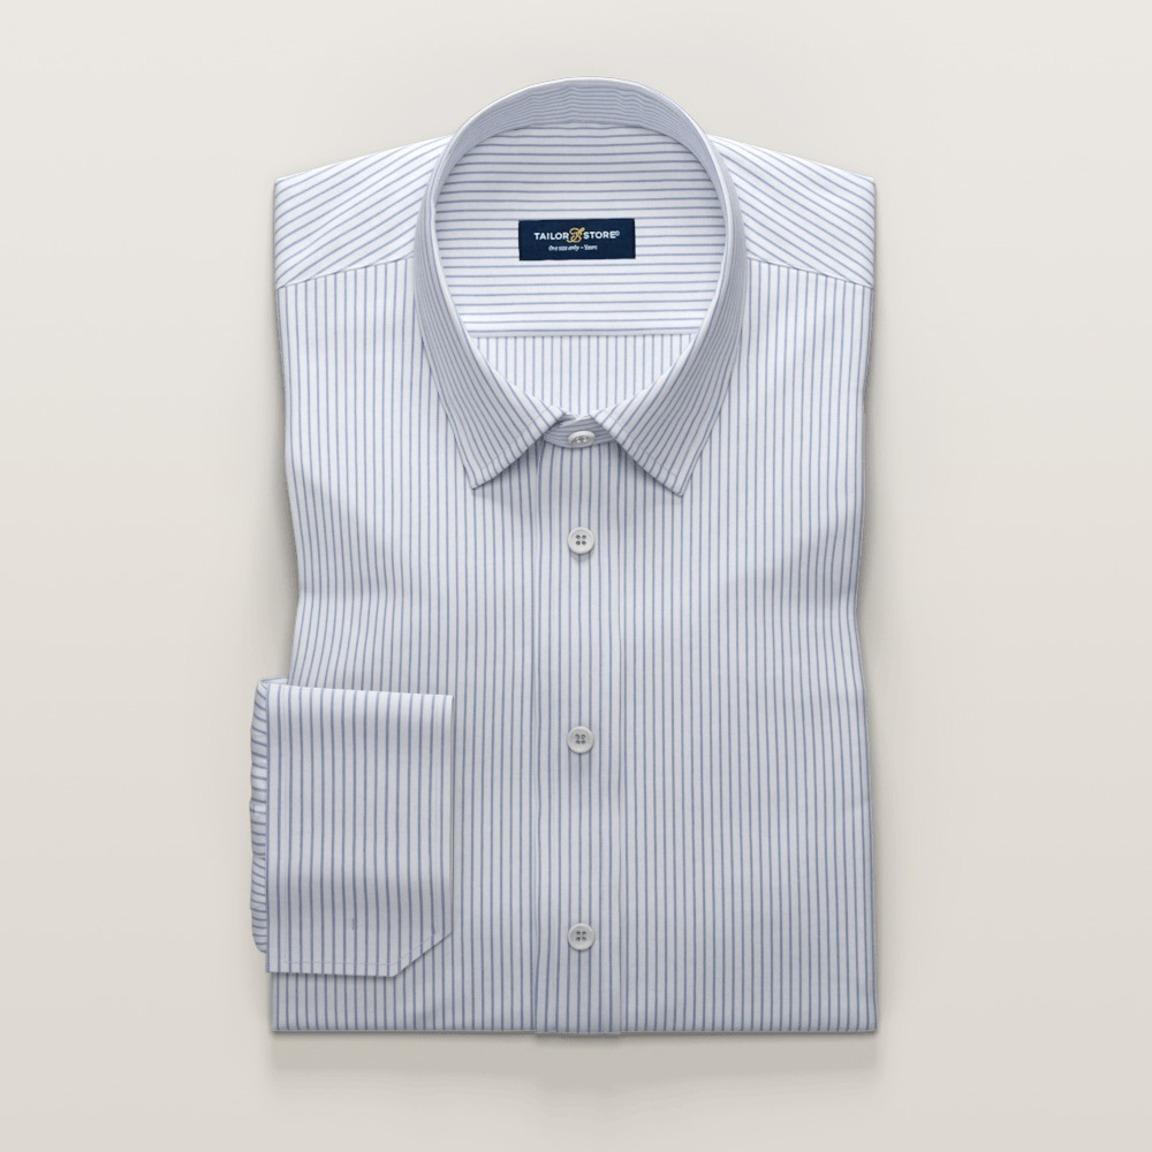 Men's shirt - Park row, white and blue